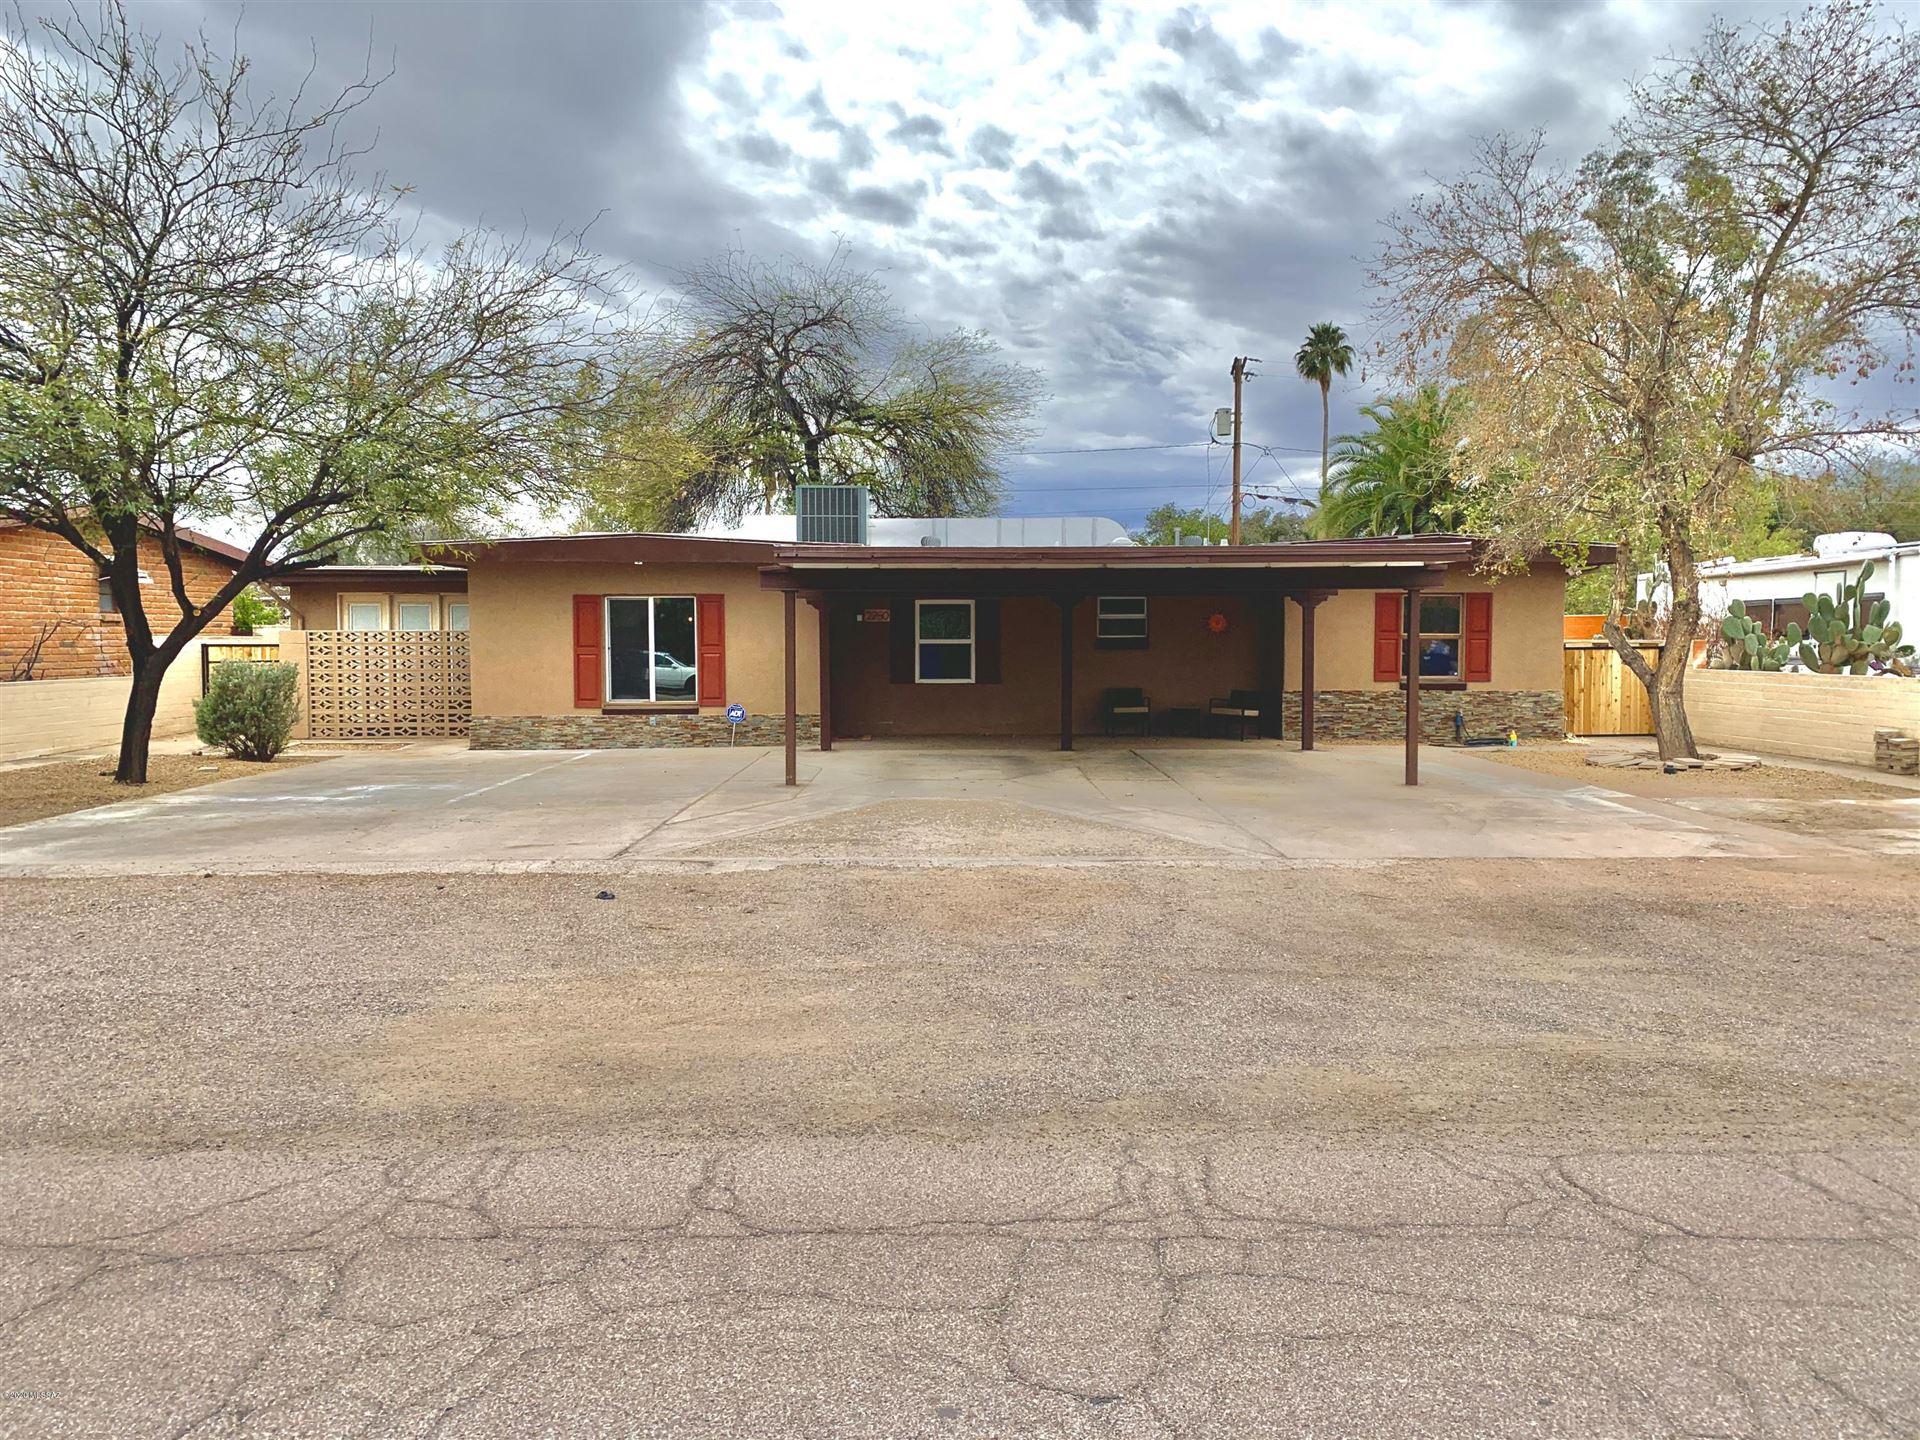 2250 E Copper Street, Tucson, AZ 85719 - MLS#: 22007404